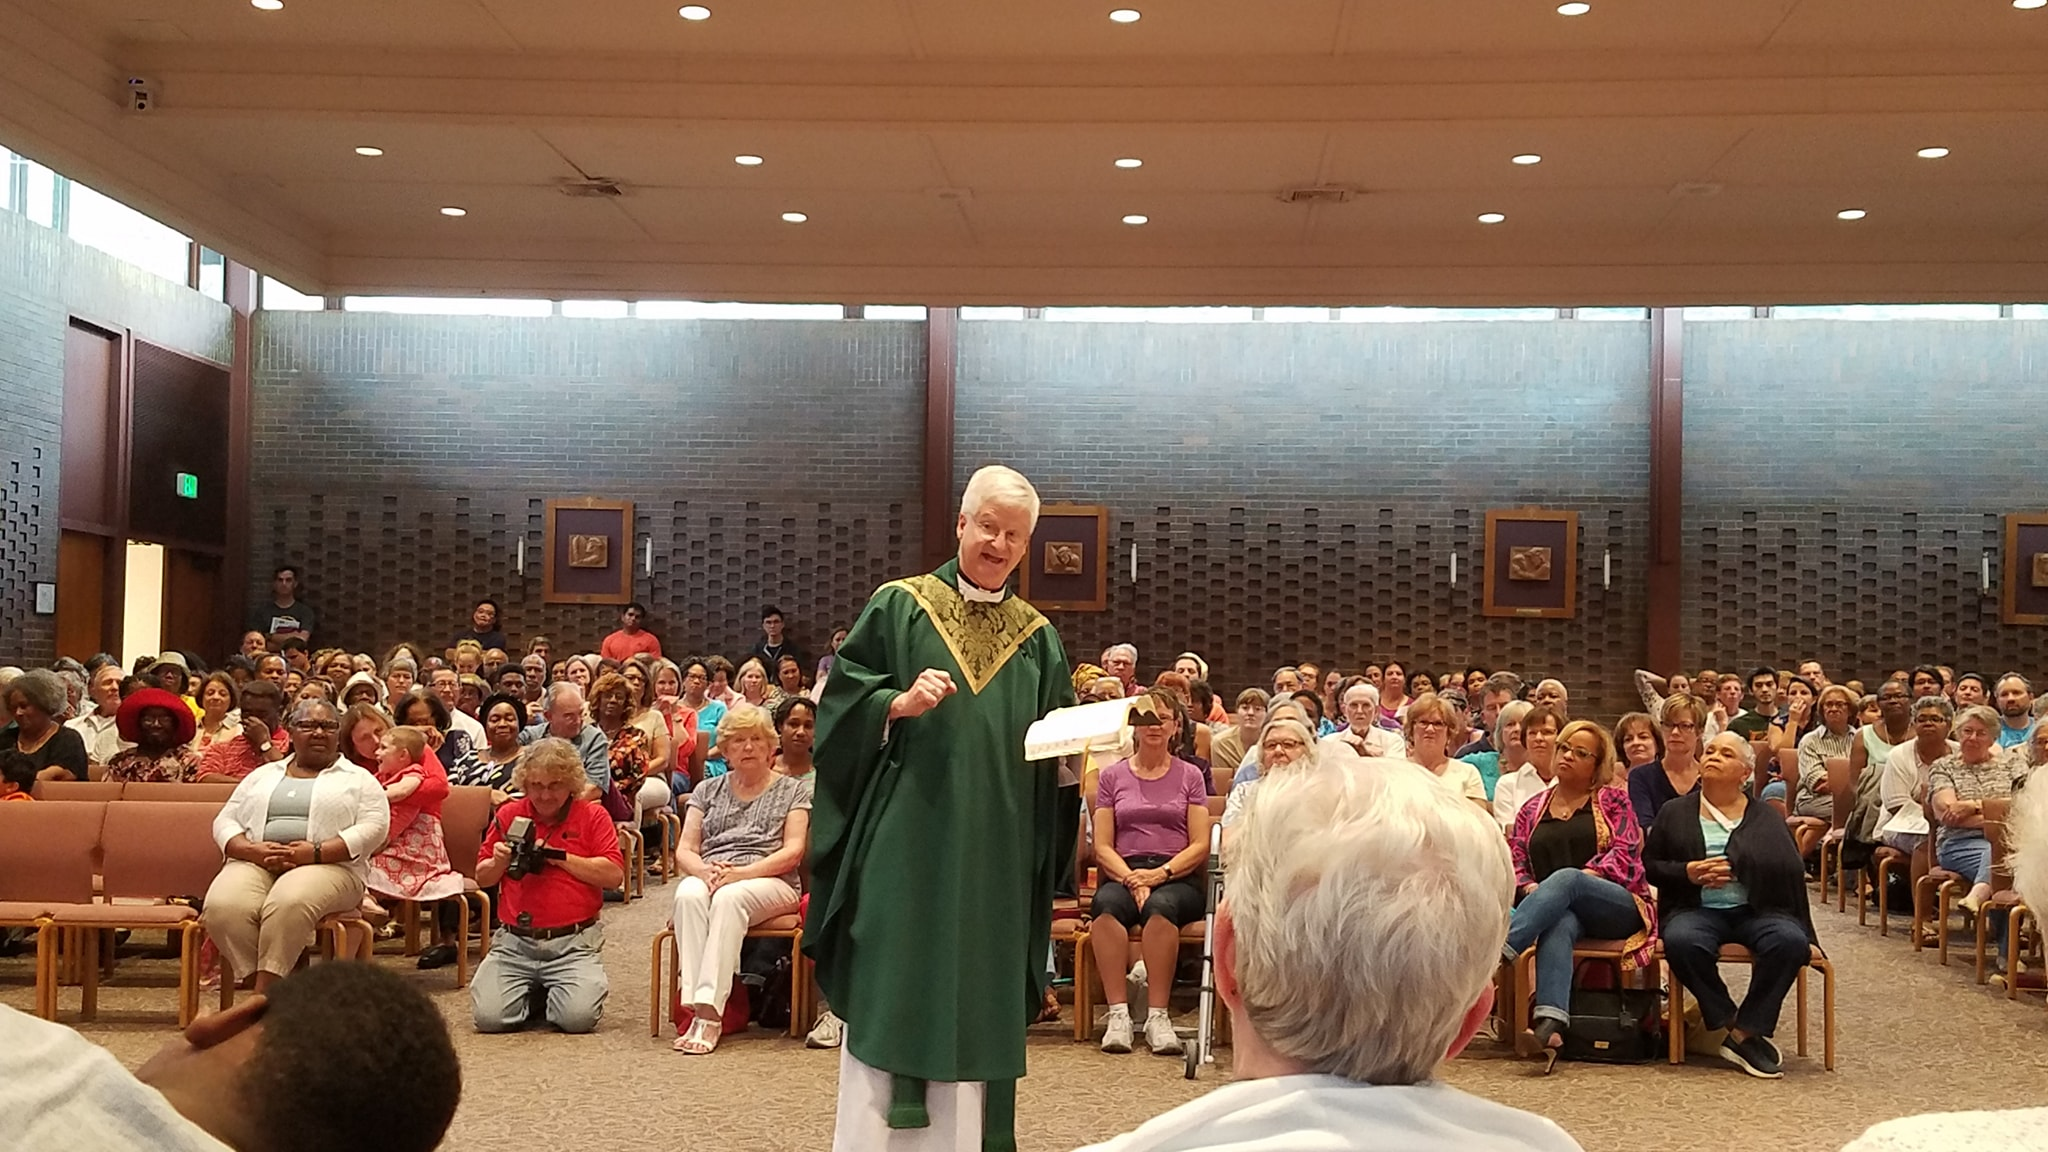 Fr. Rich at St. John's 3.jpg